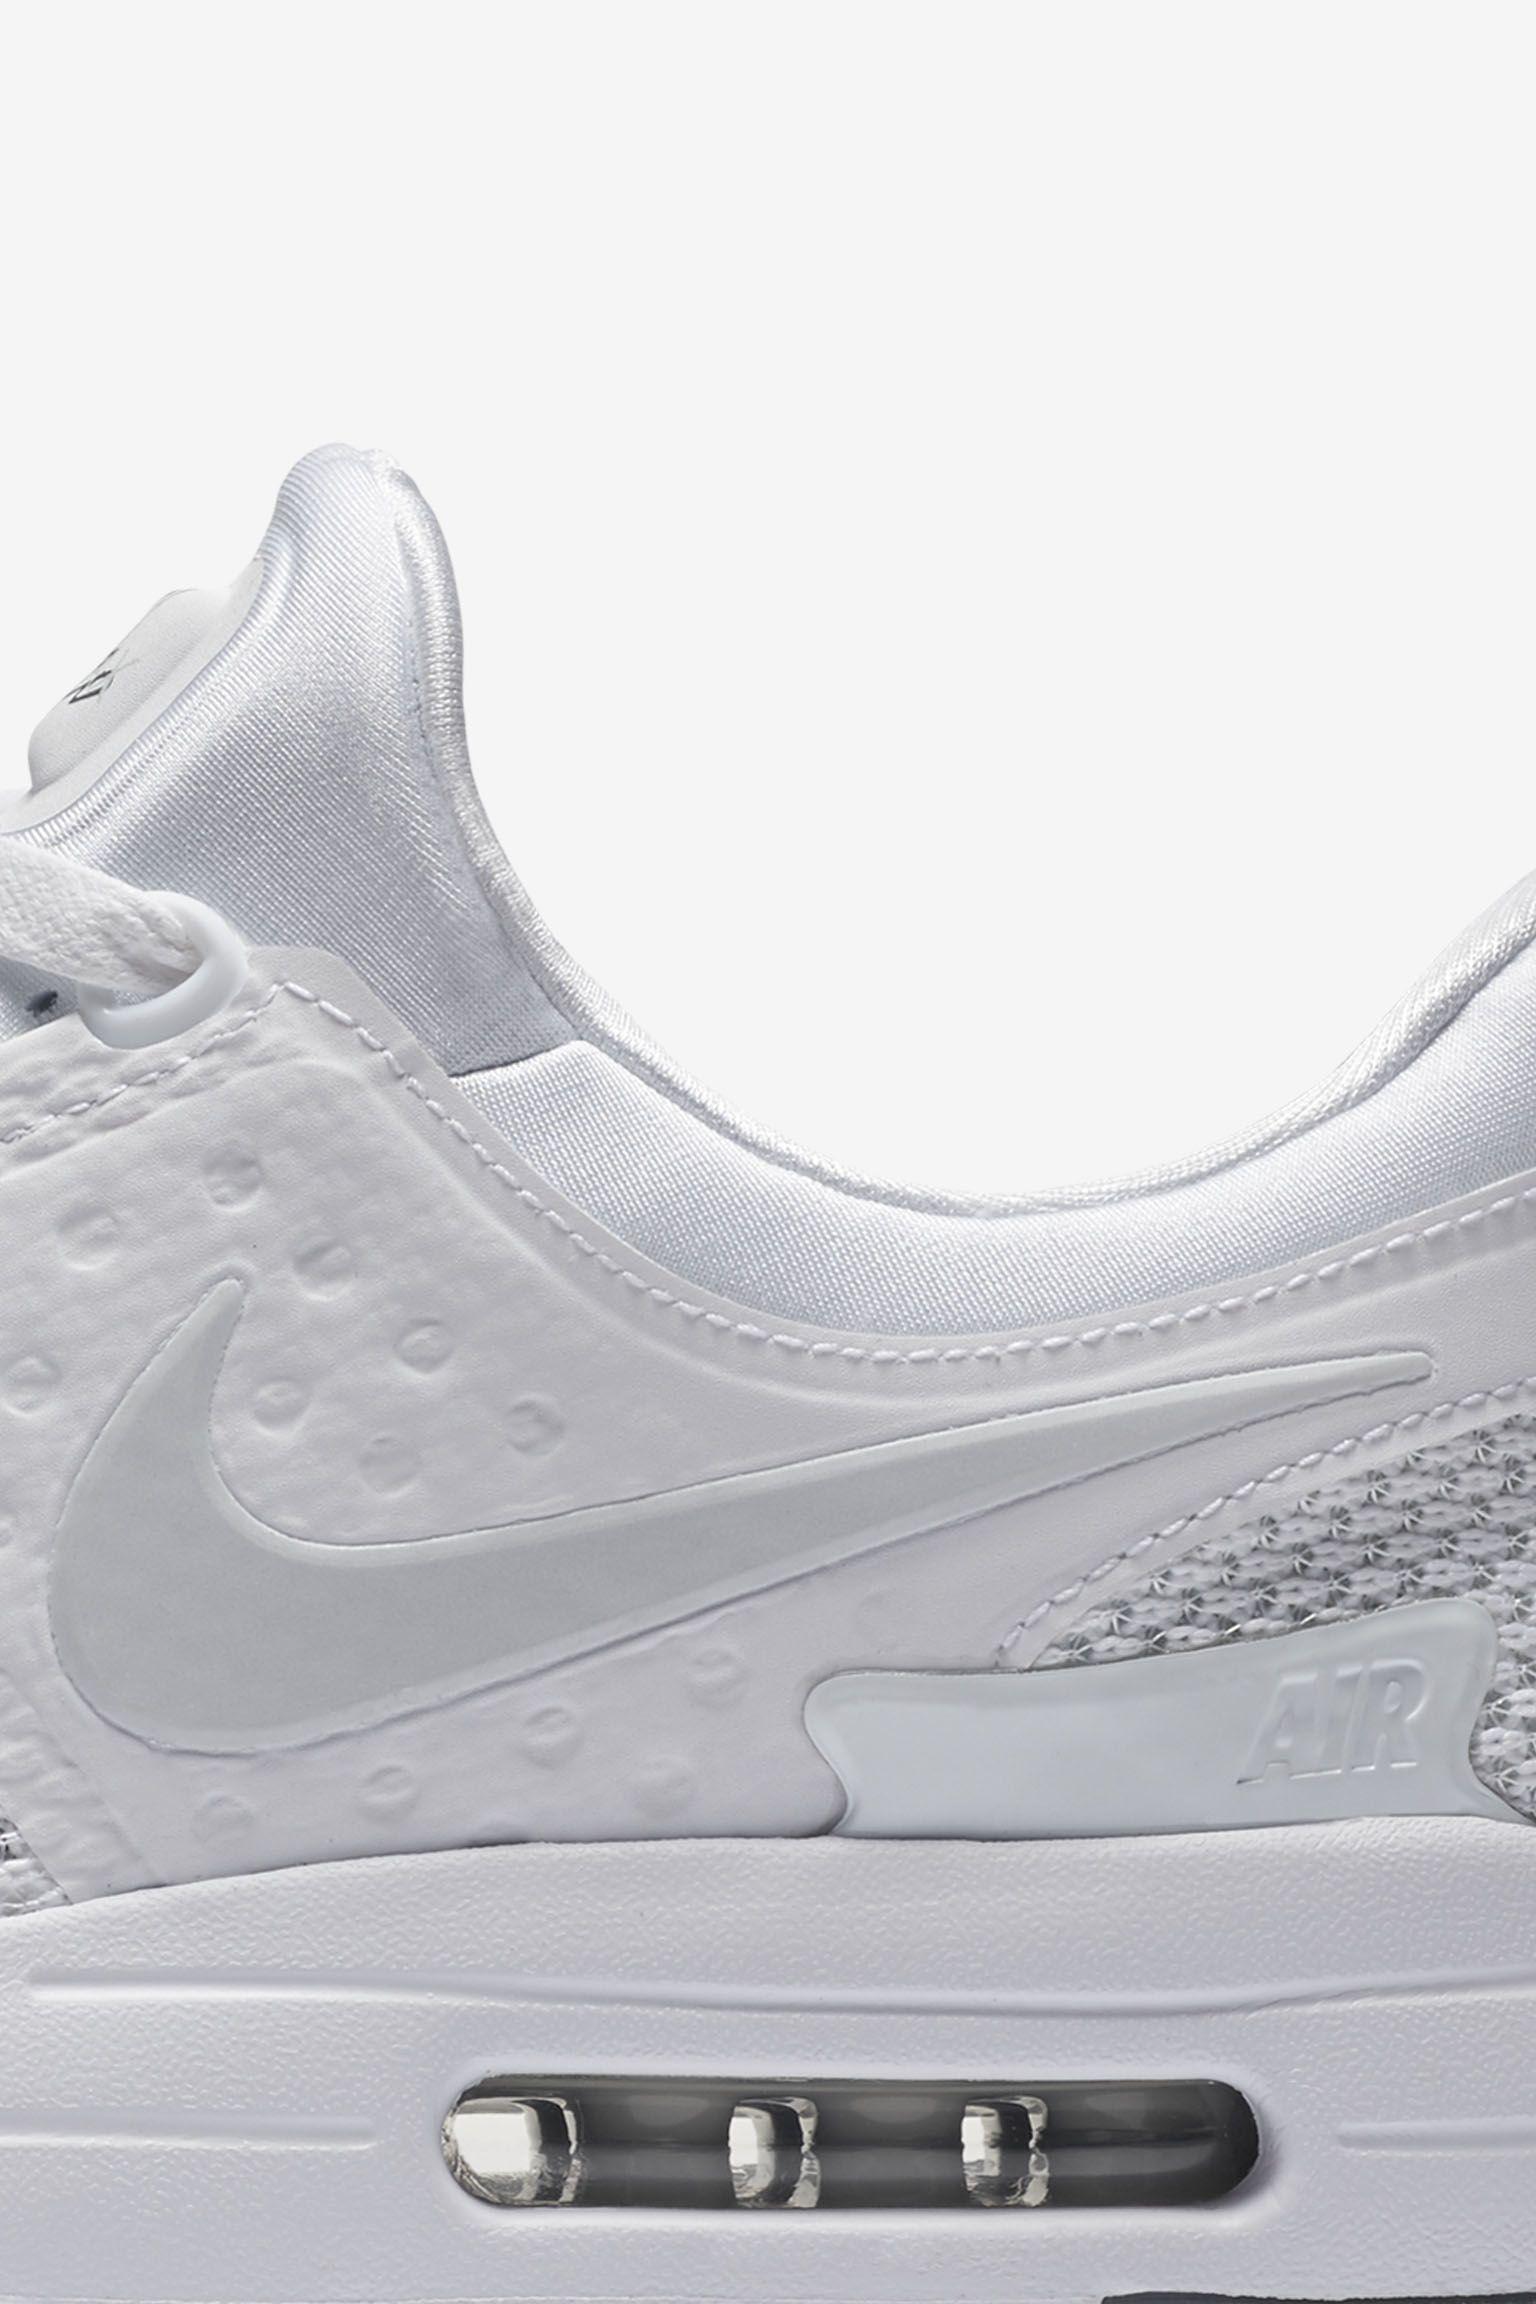 Nike Air Max Zero 'Triple White' Release Date